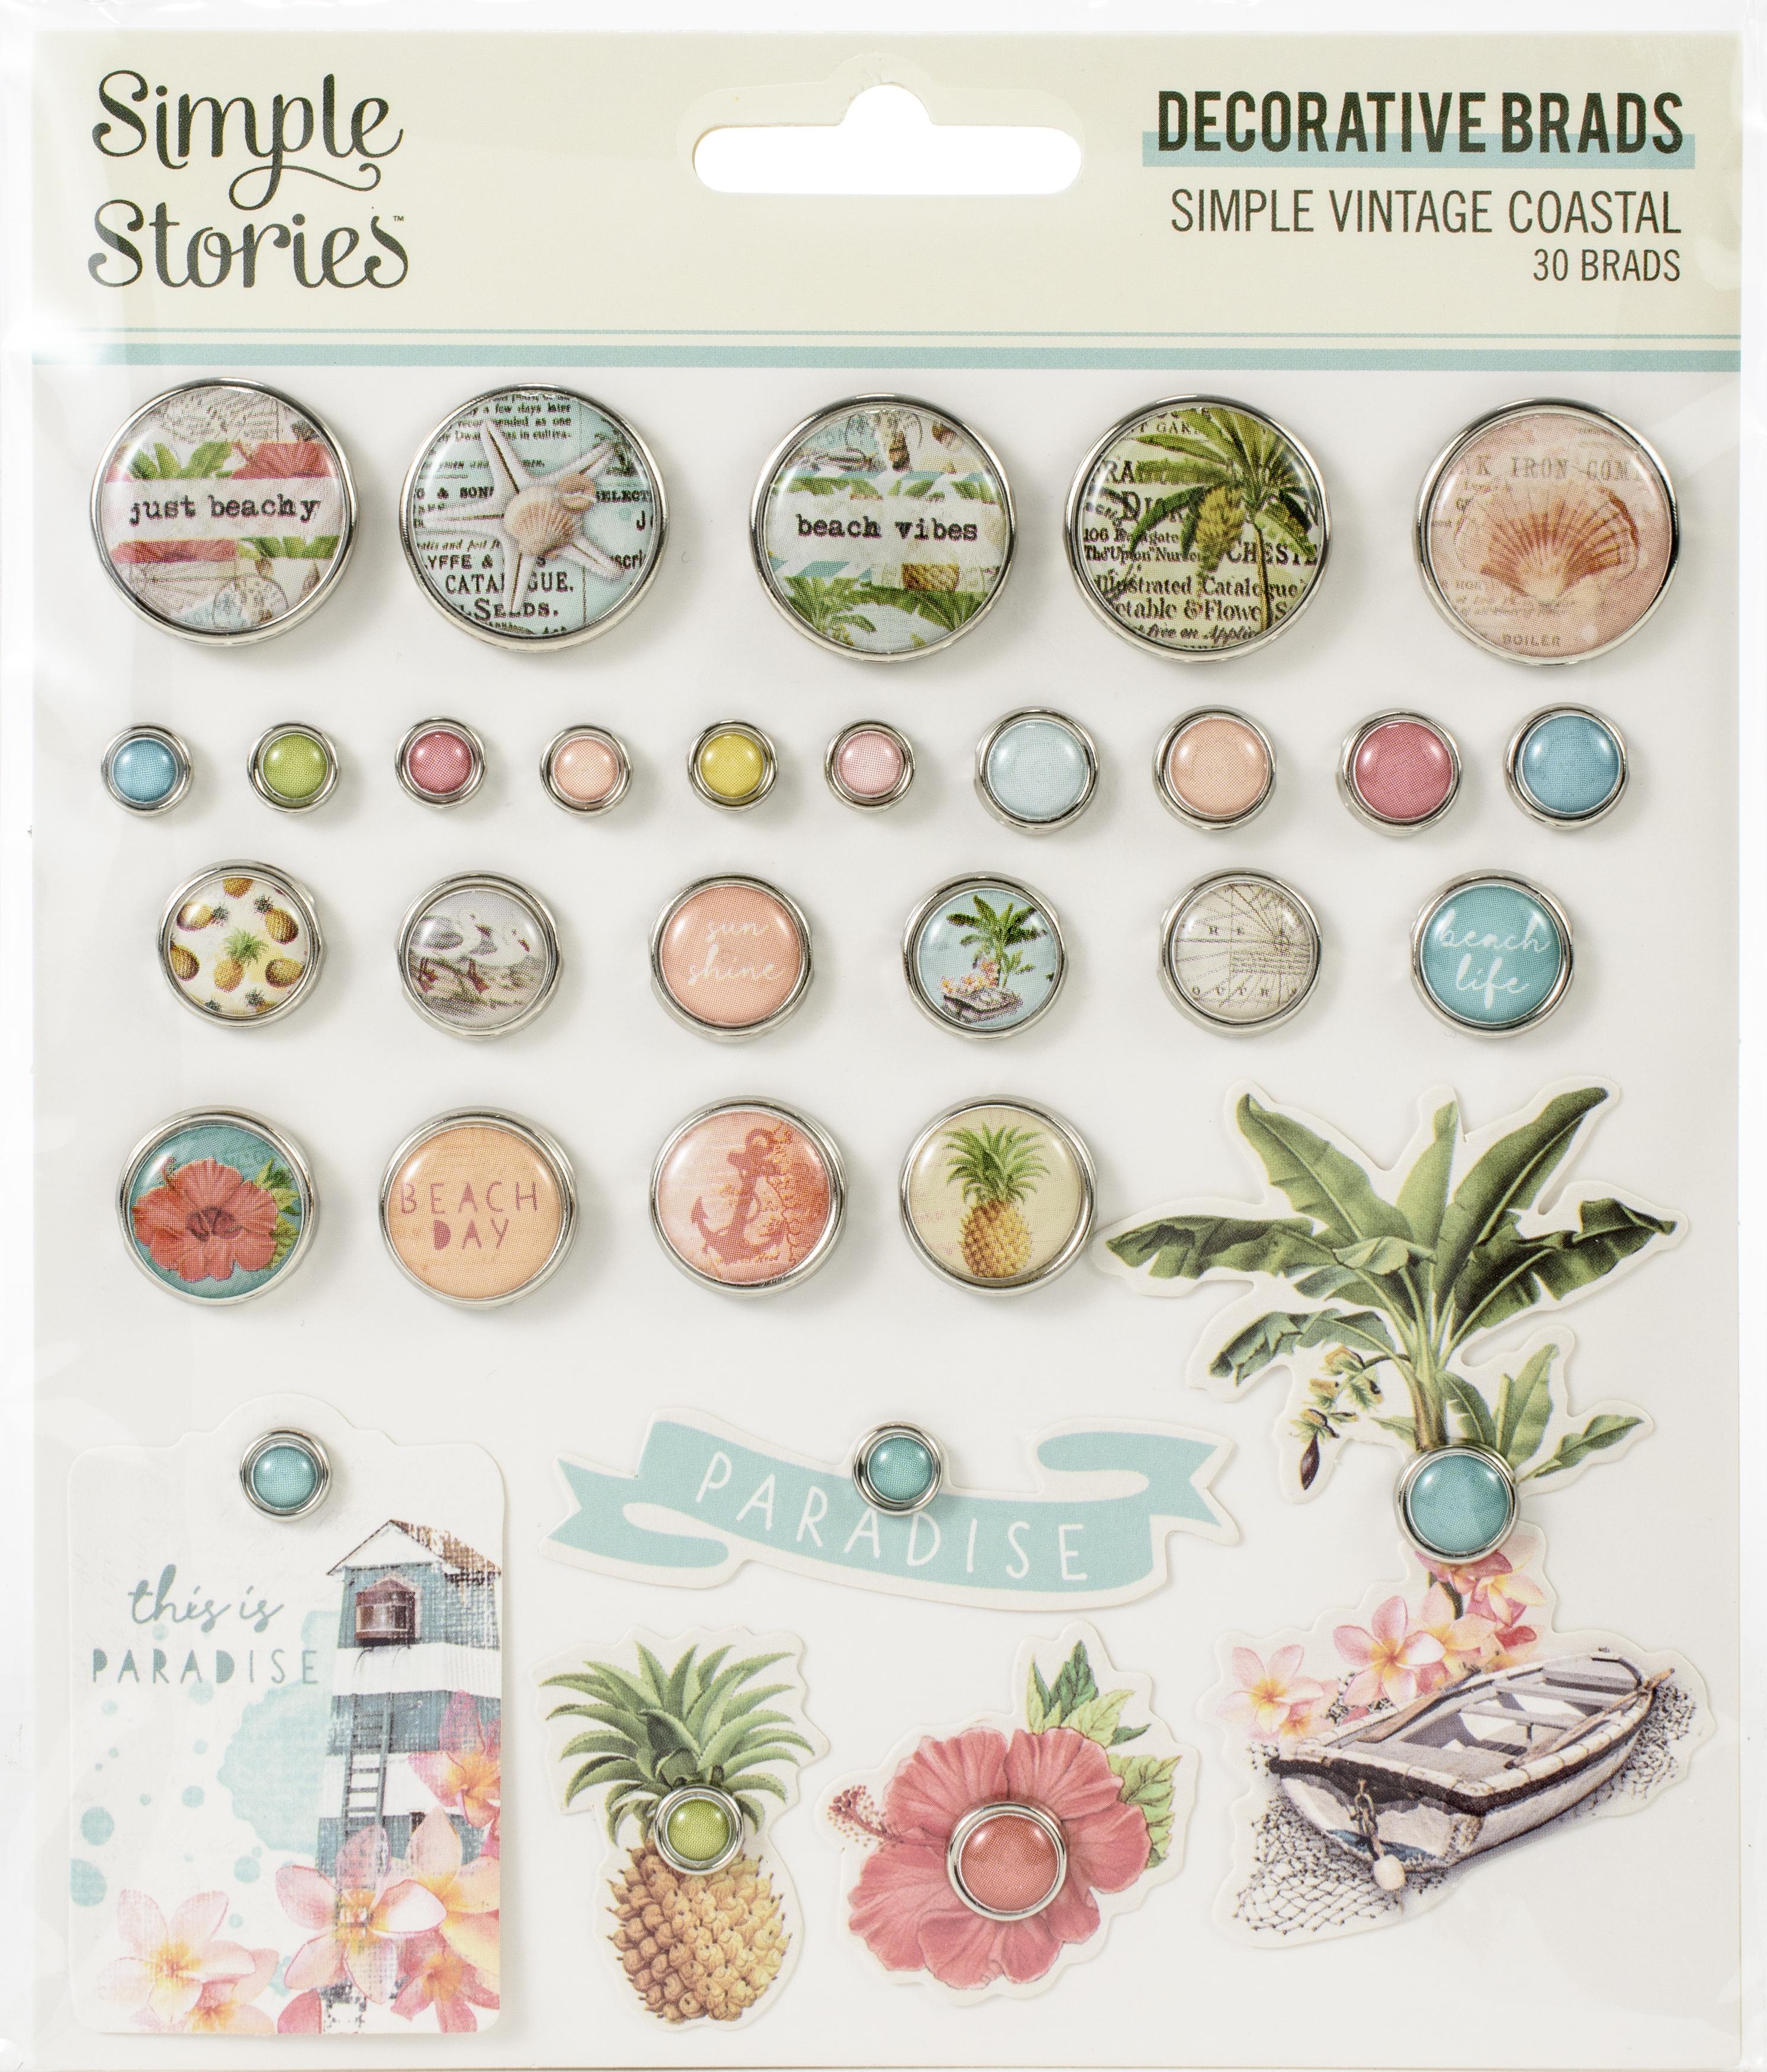 Simple Vintage Coastal Decorative Brads 30/Pkg-